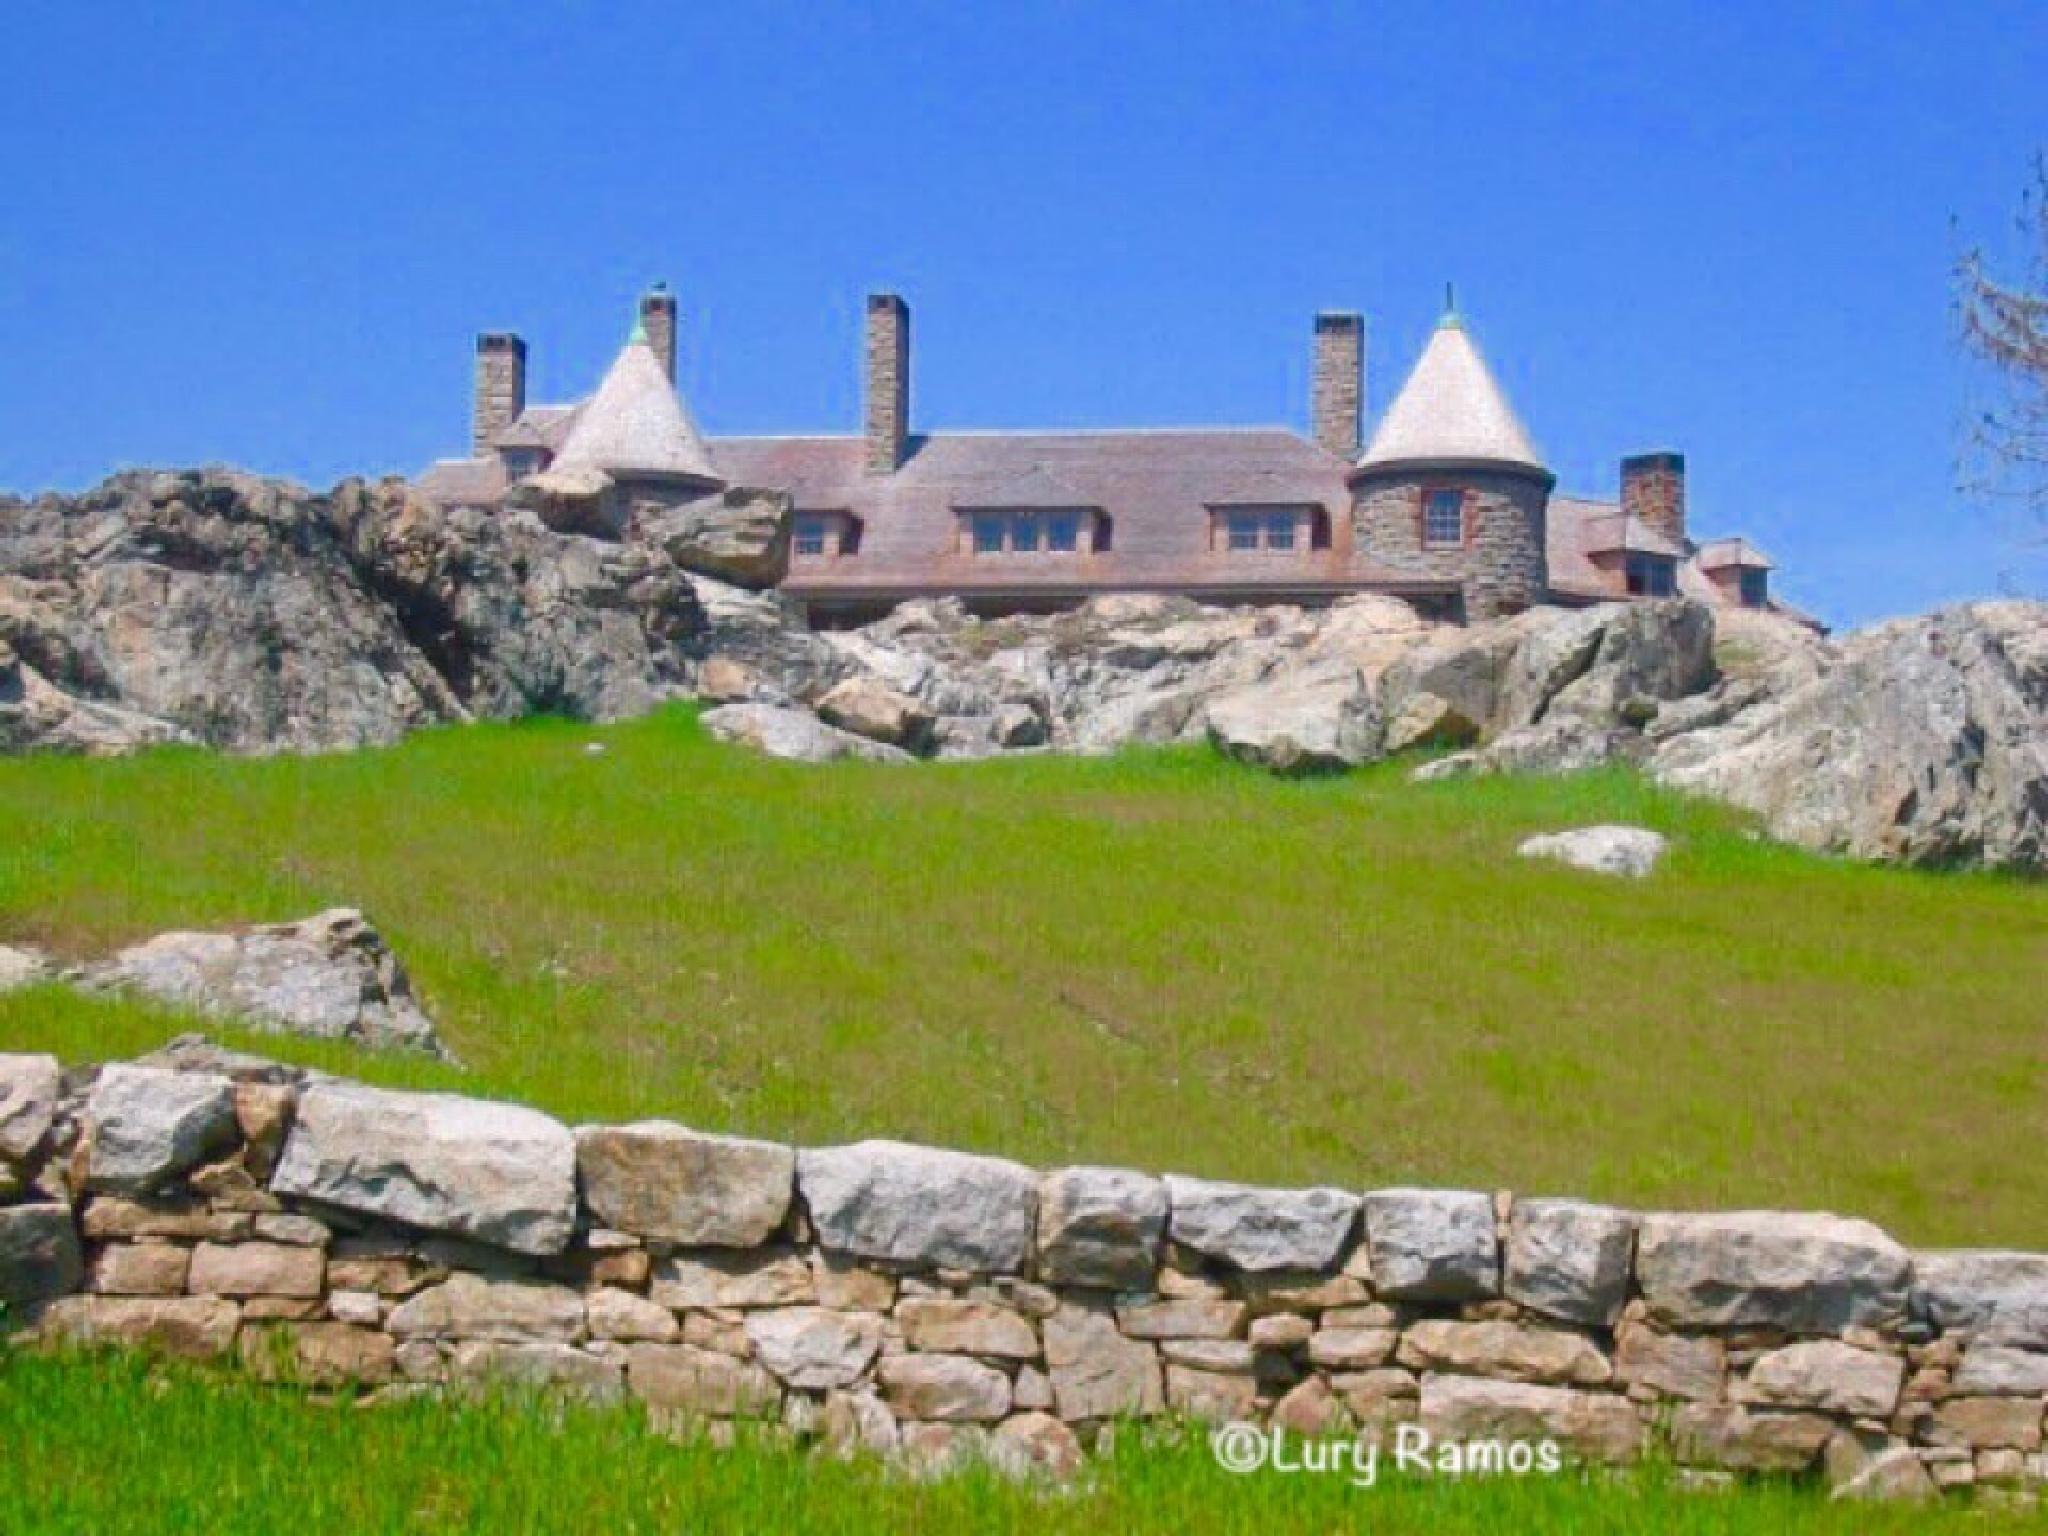 Rock House by Lury Ramos